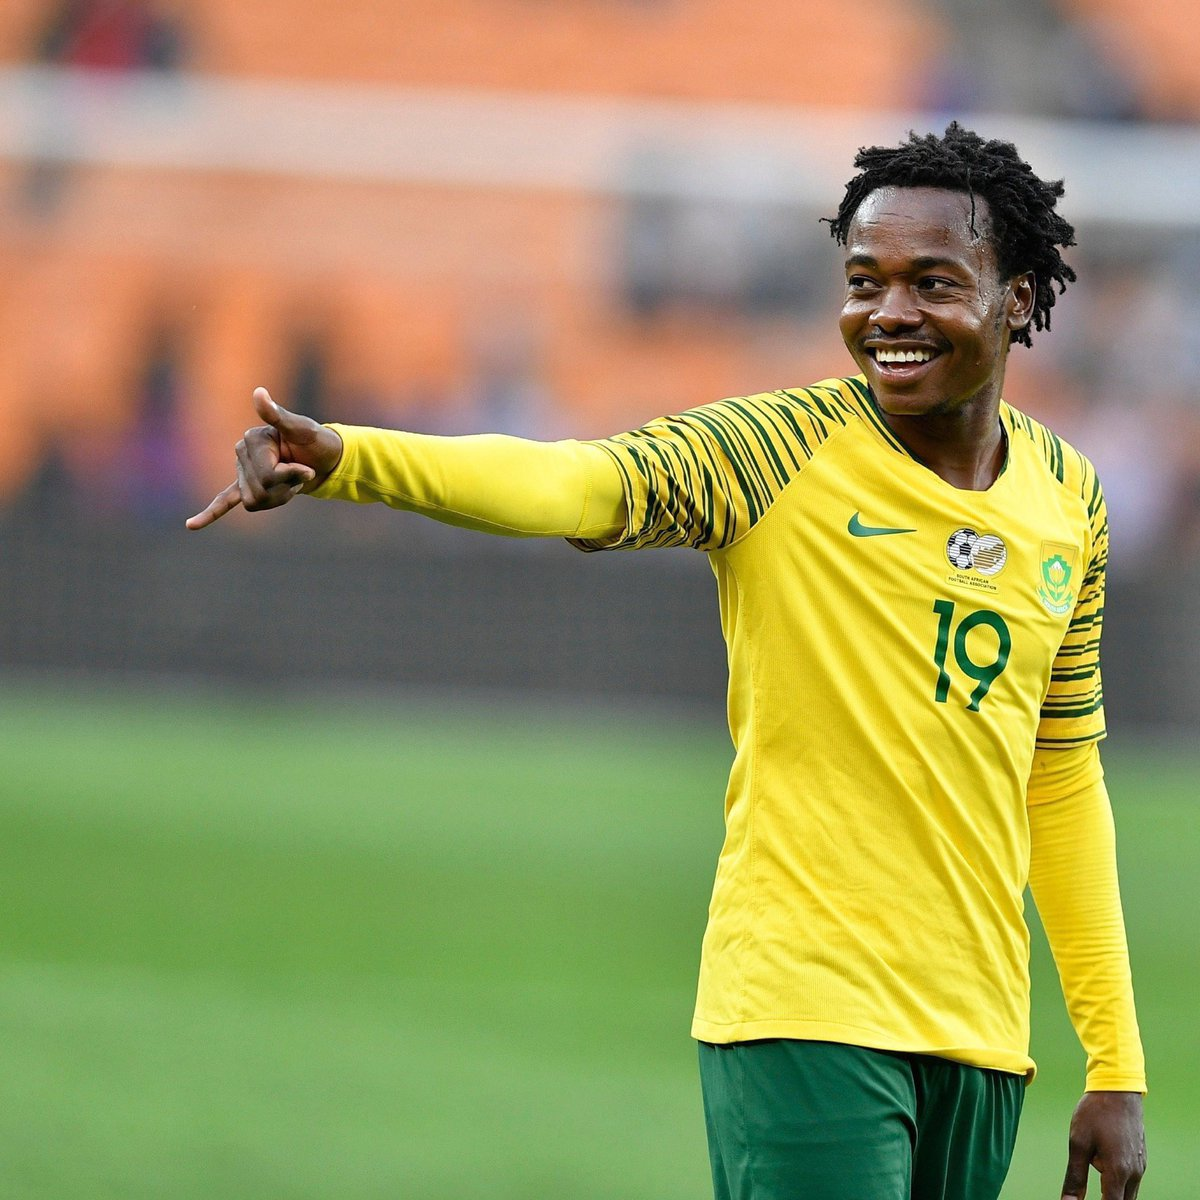 Transfer news:  Belgian giants, Club Brugge are pushing to sign Bafana Bafana striker Percy Tau (25) on loan from Brighton. 🇿🇦🇿🇦⚽️ https://t.co/7KxhPD4lMd